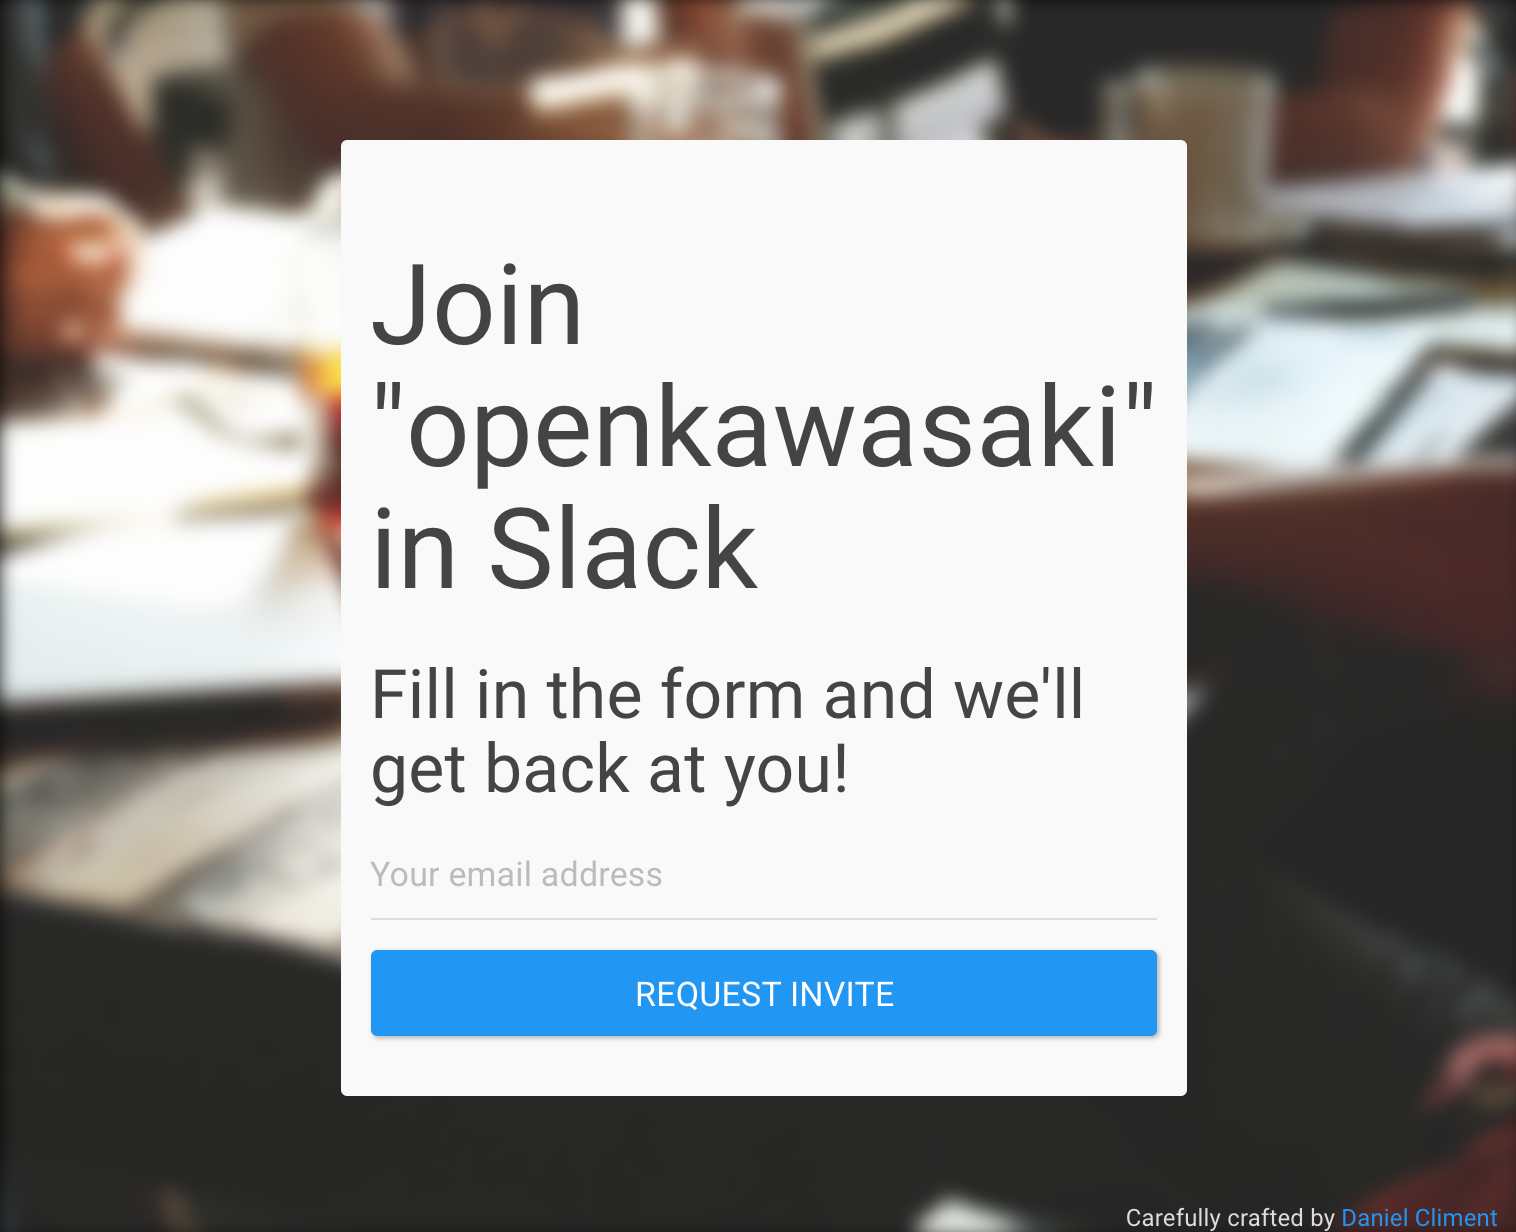 slackinvite.png